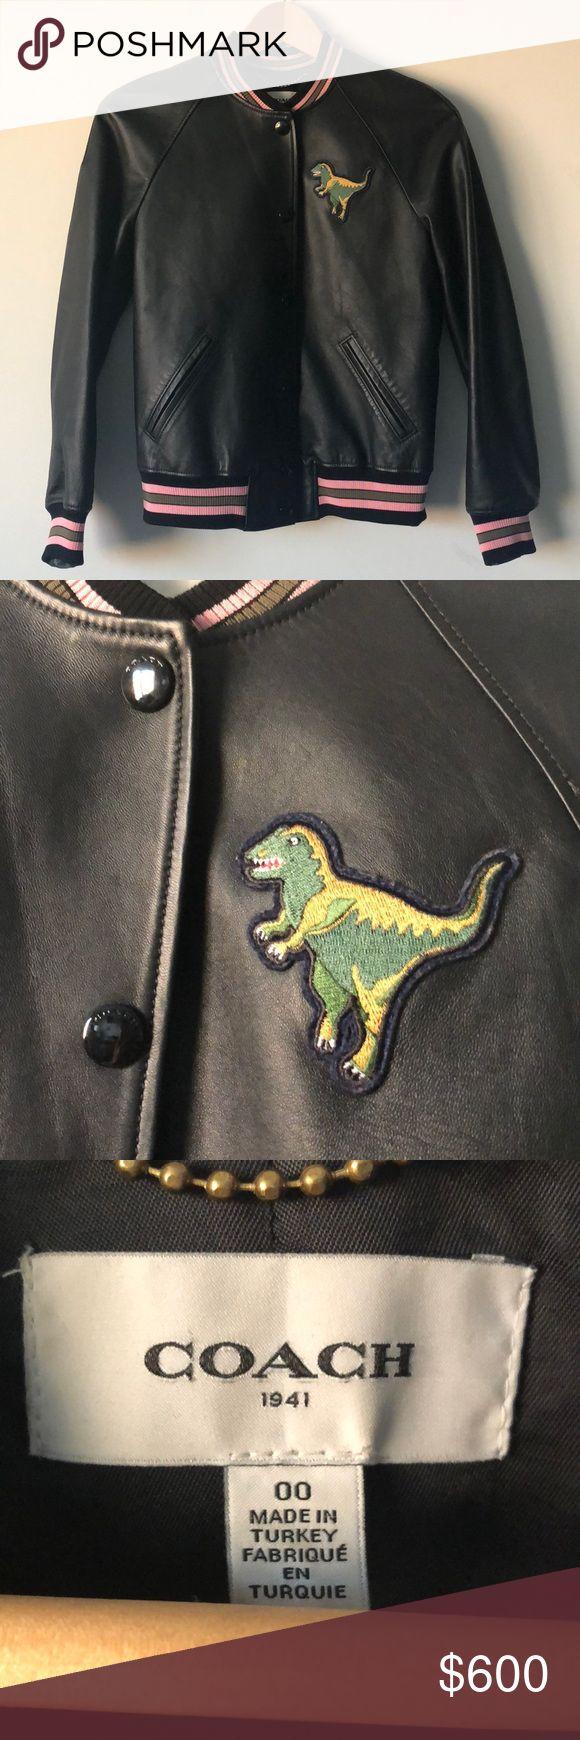 Coach Leather Varsity Trex Jacket size 00 Preowned